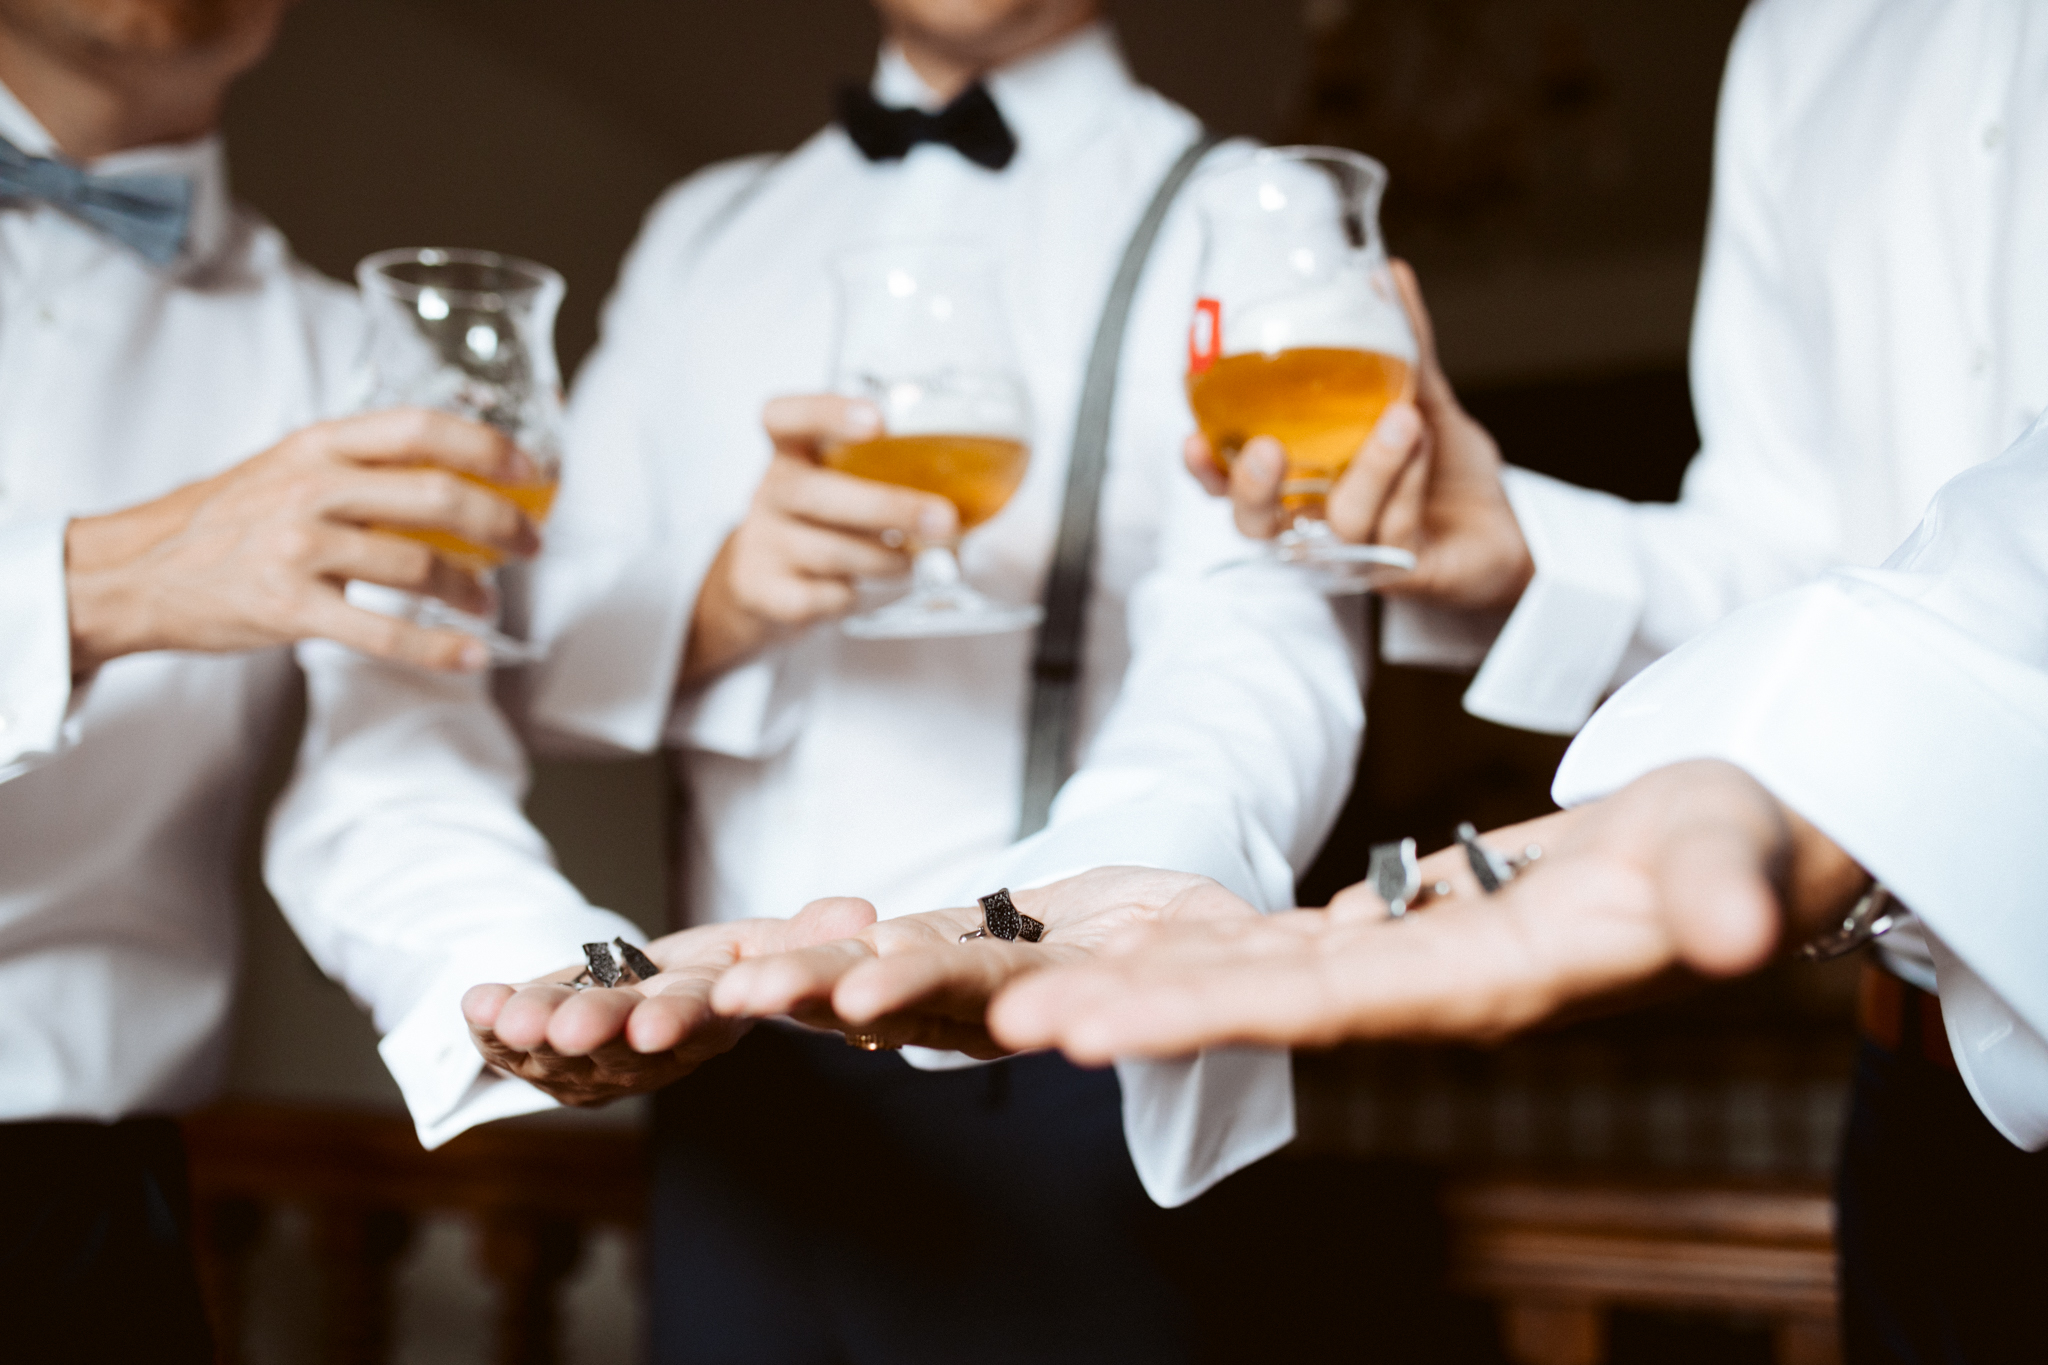 Marriage Champagne France - 020.jpg